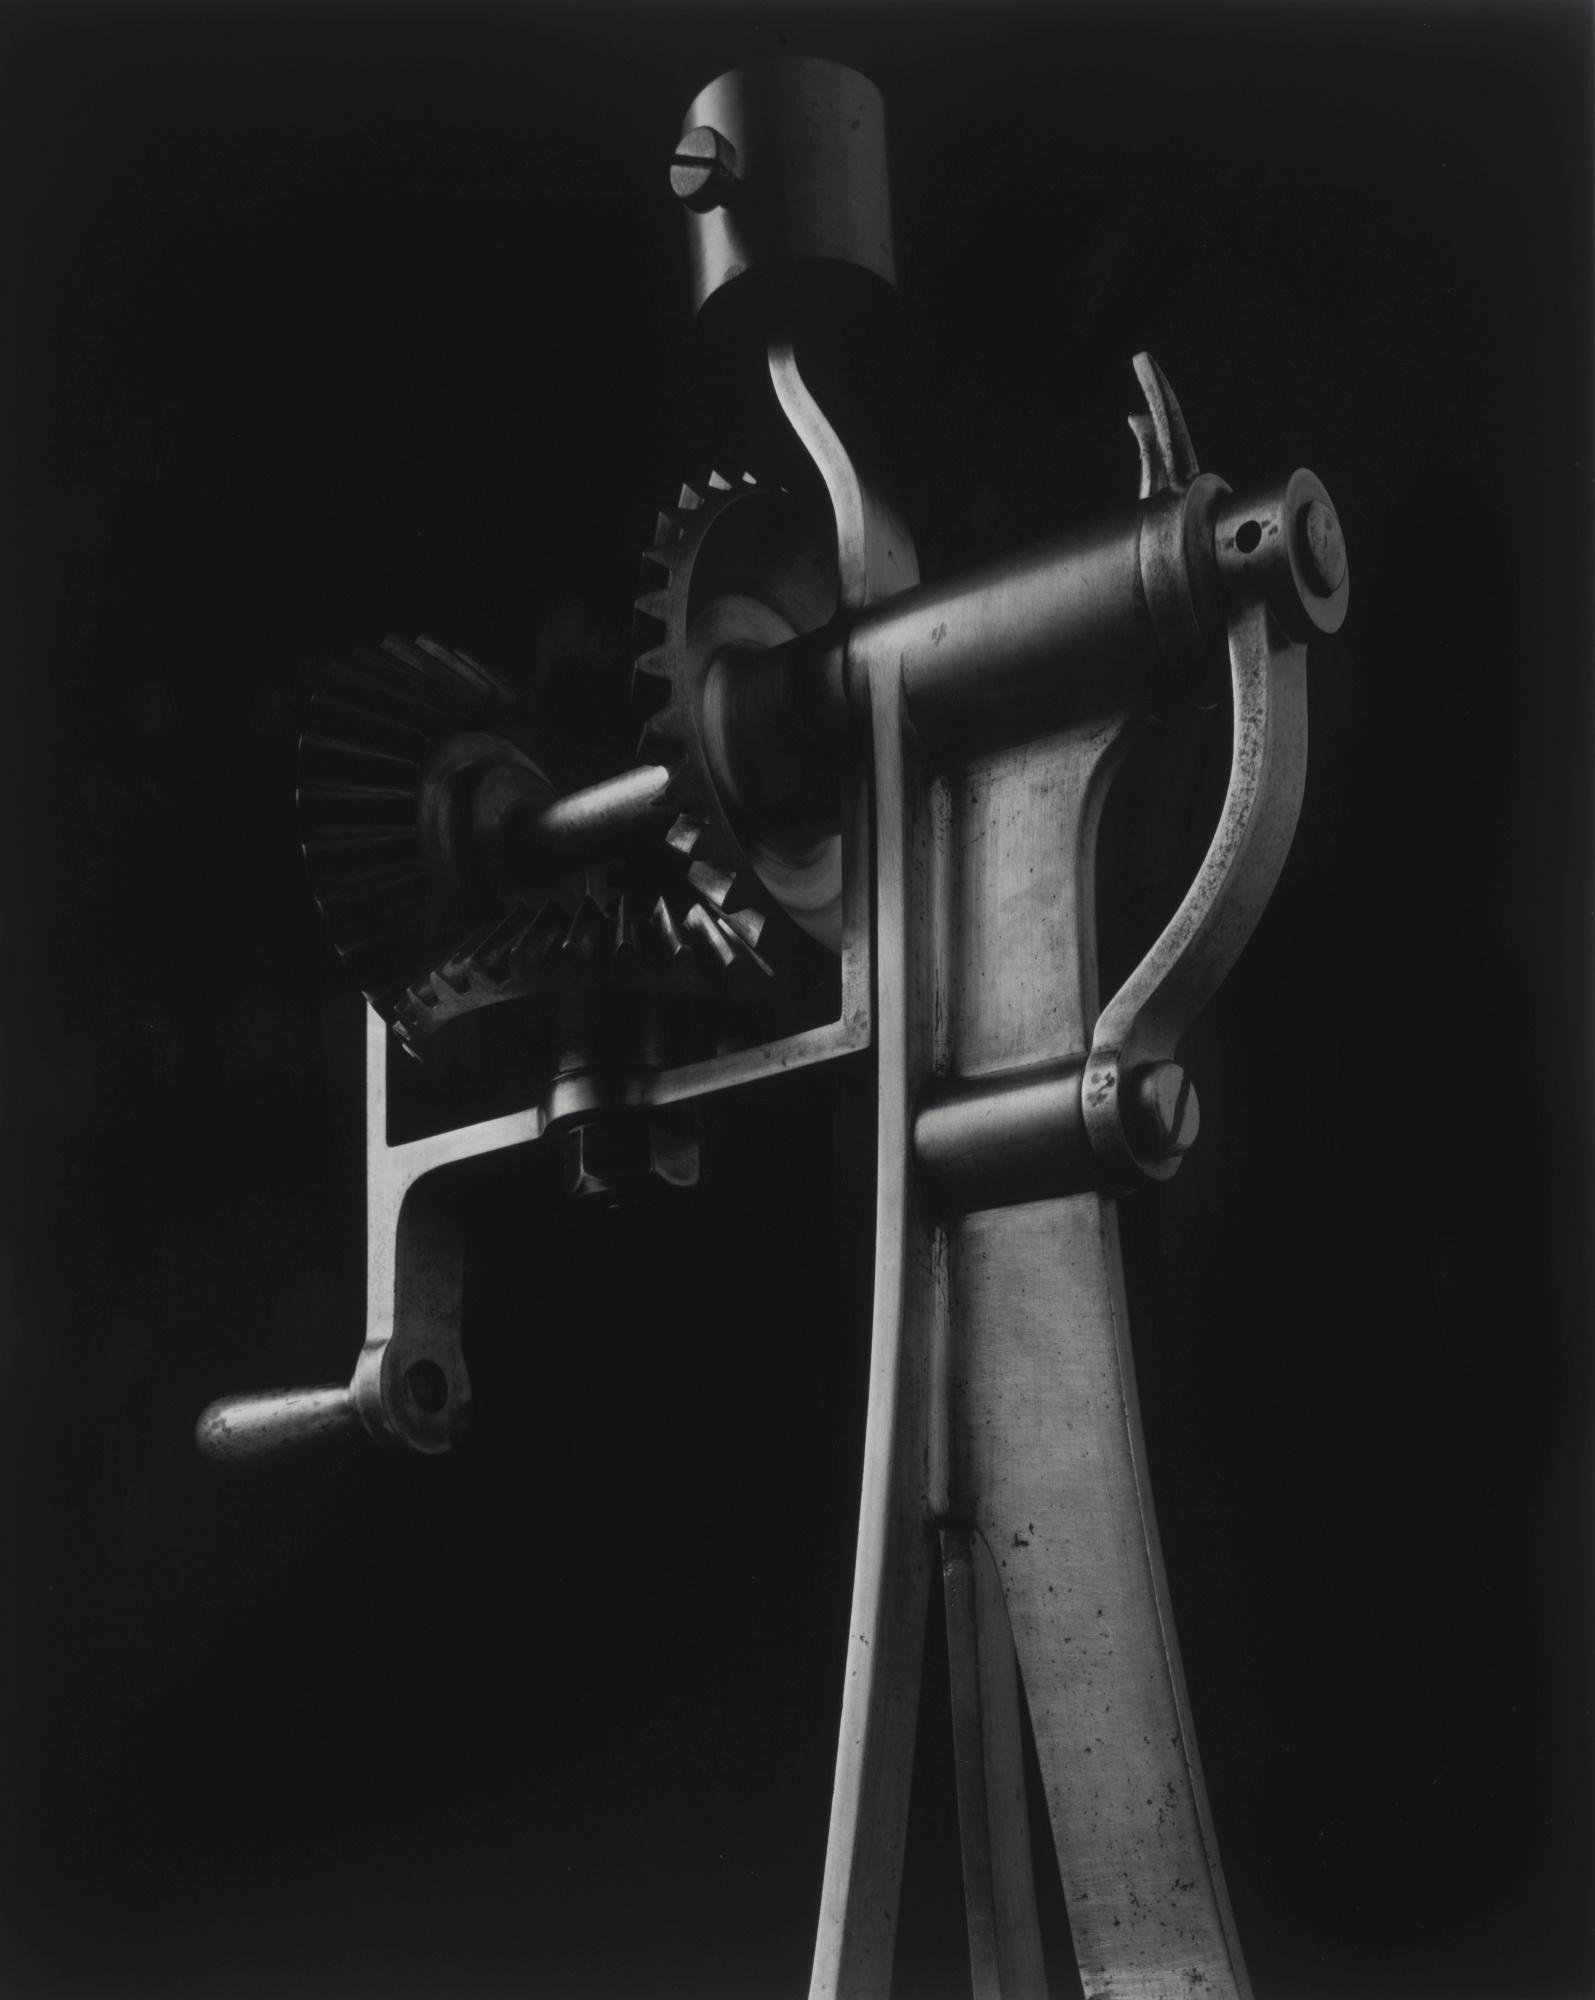 Hiroshi Sugimoto-Conceptual Forms 0033-2004